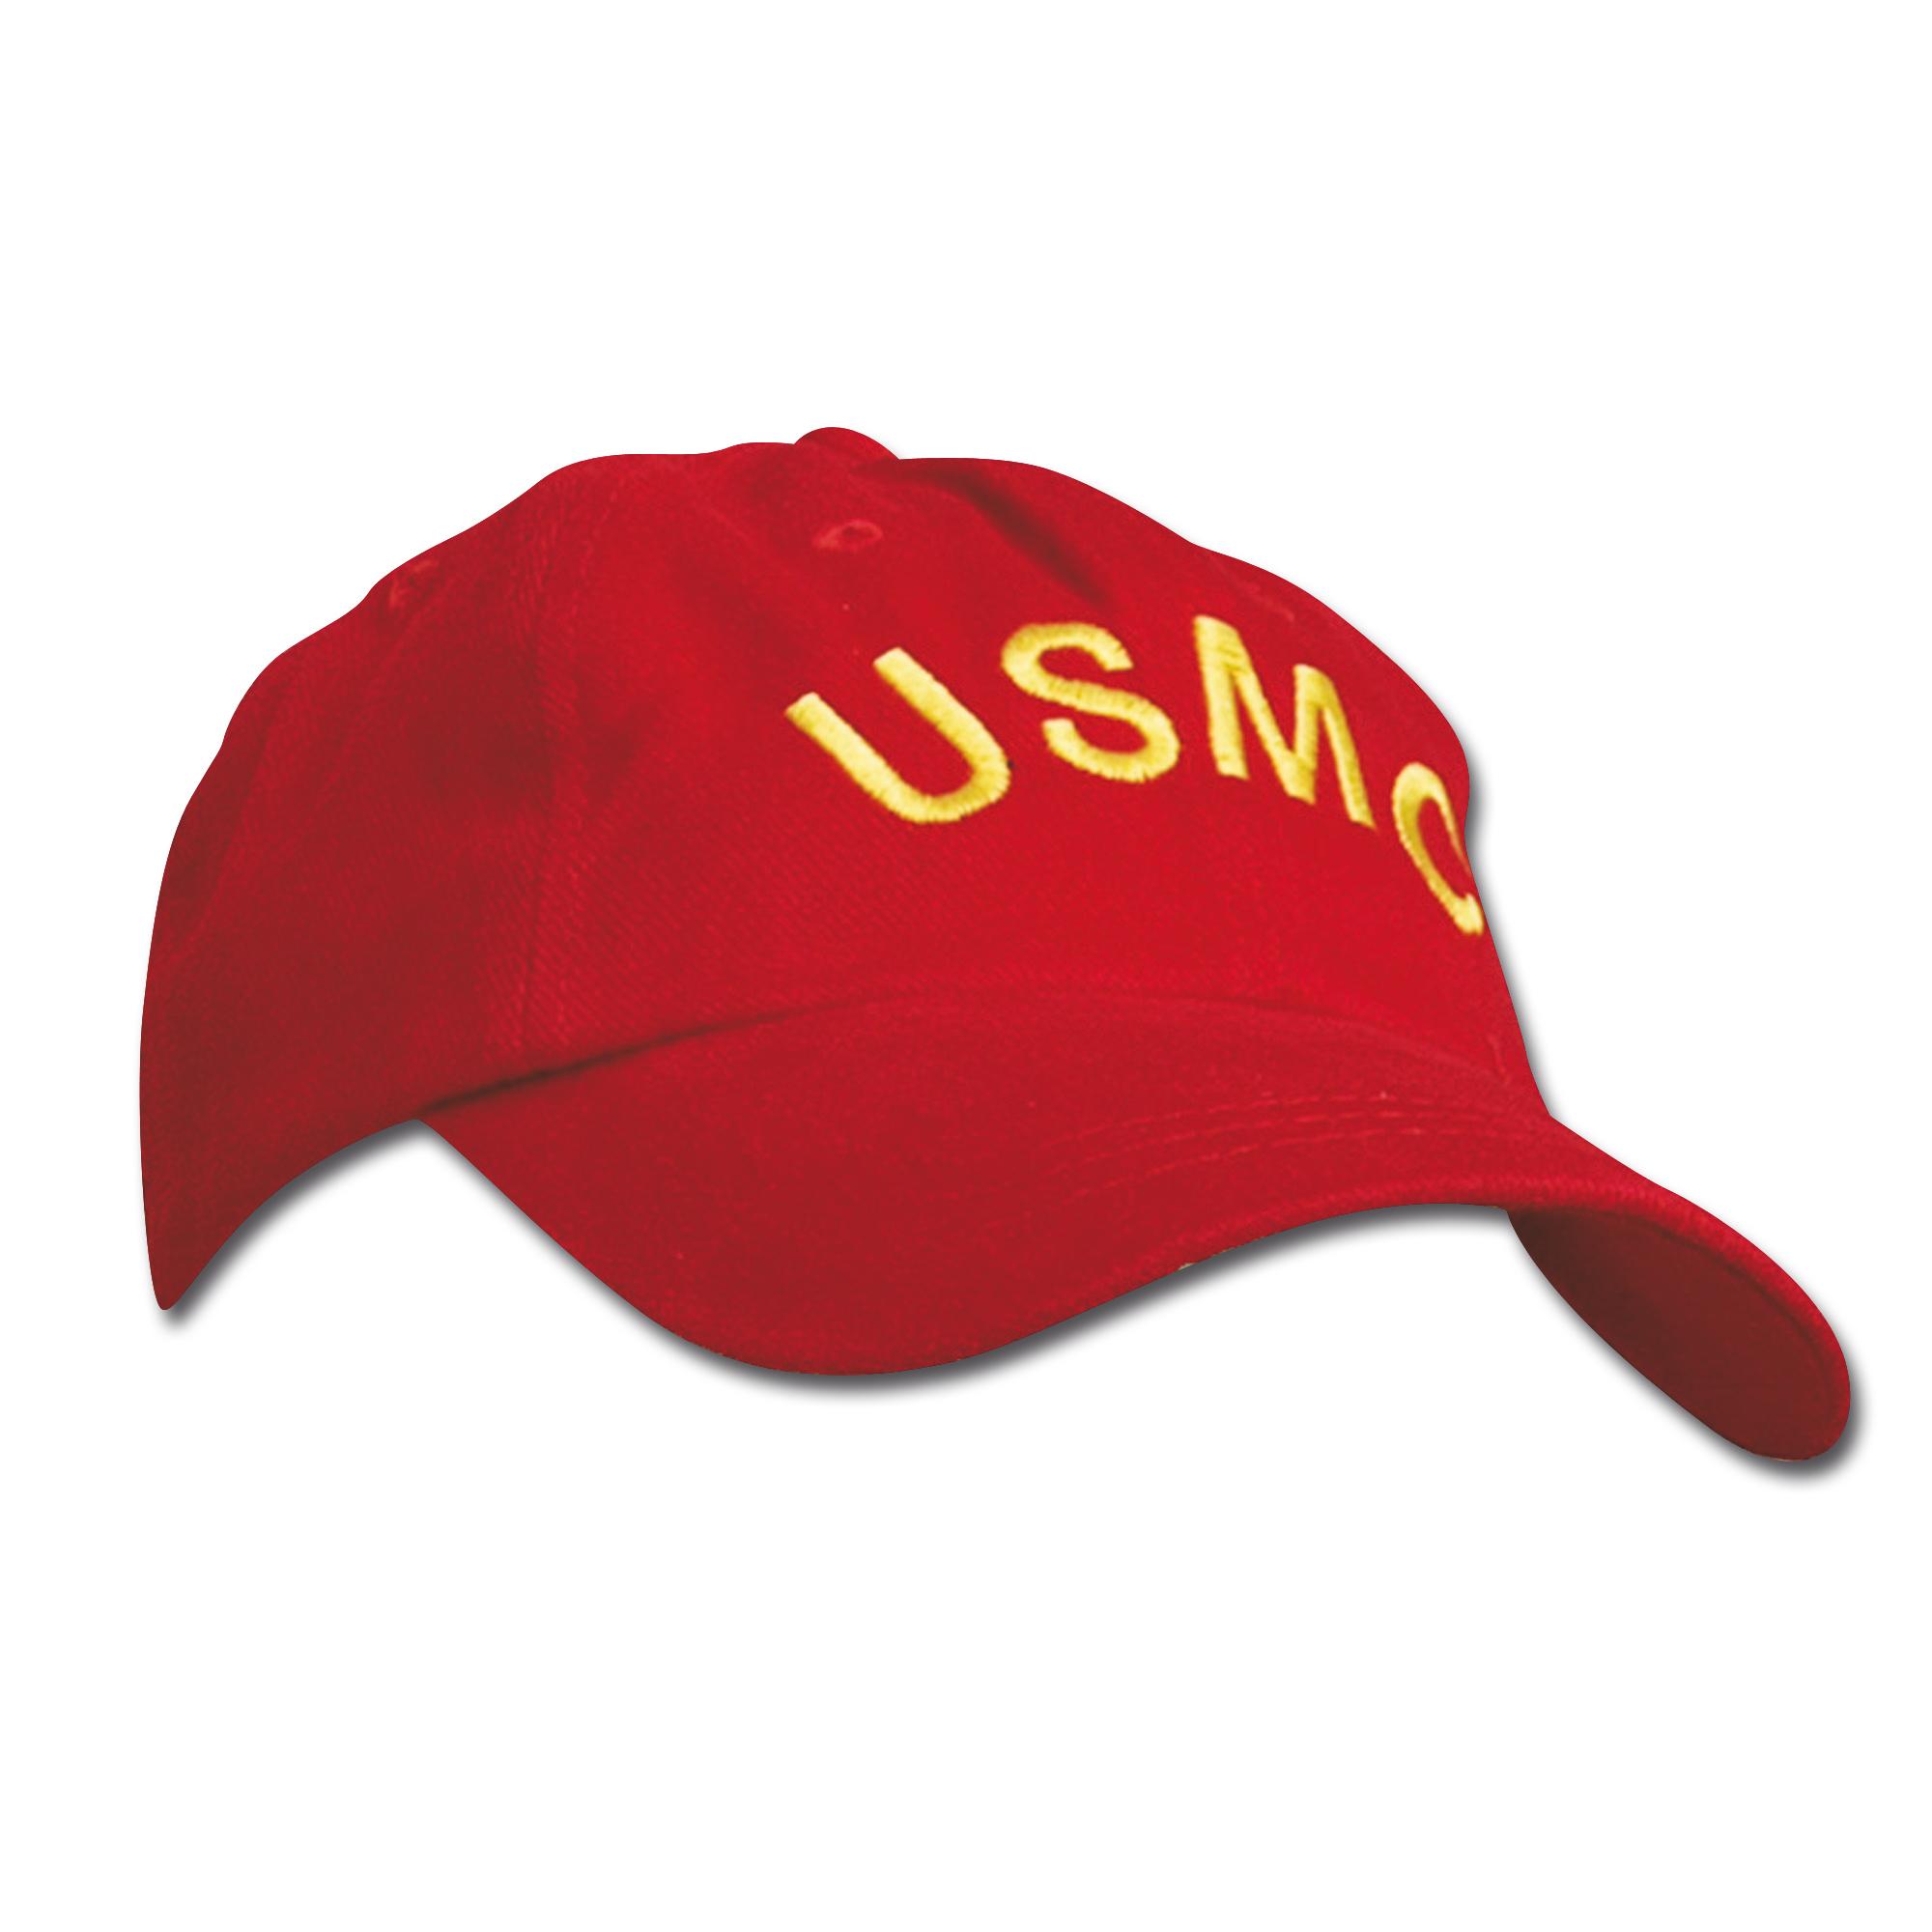 Baseball Cap USMC red